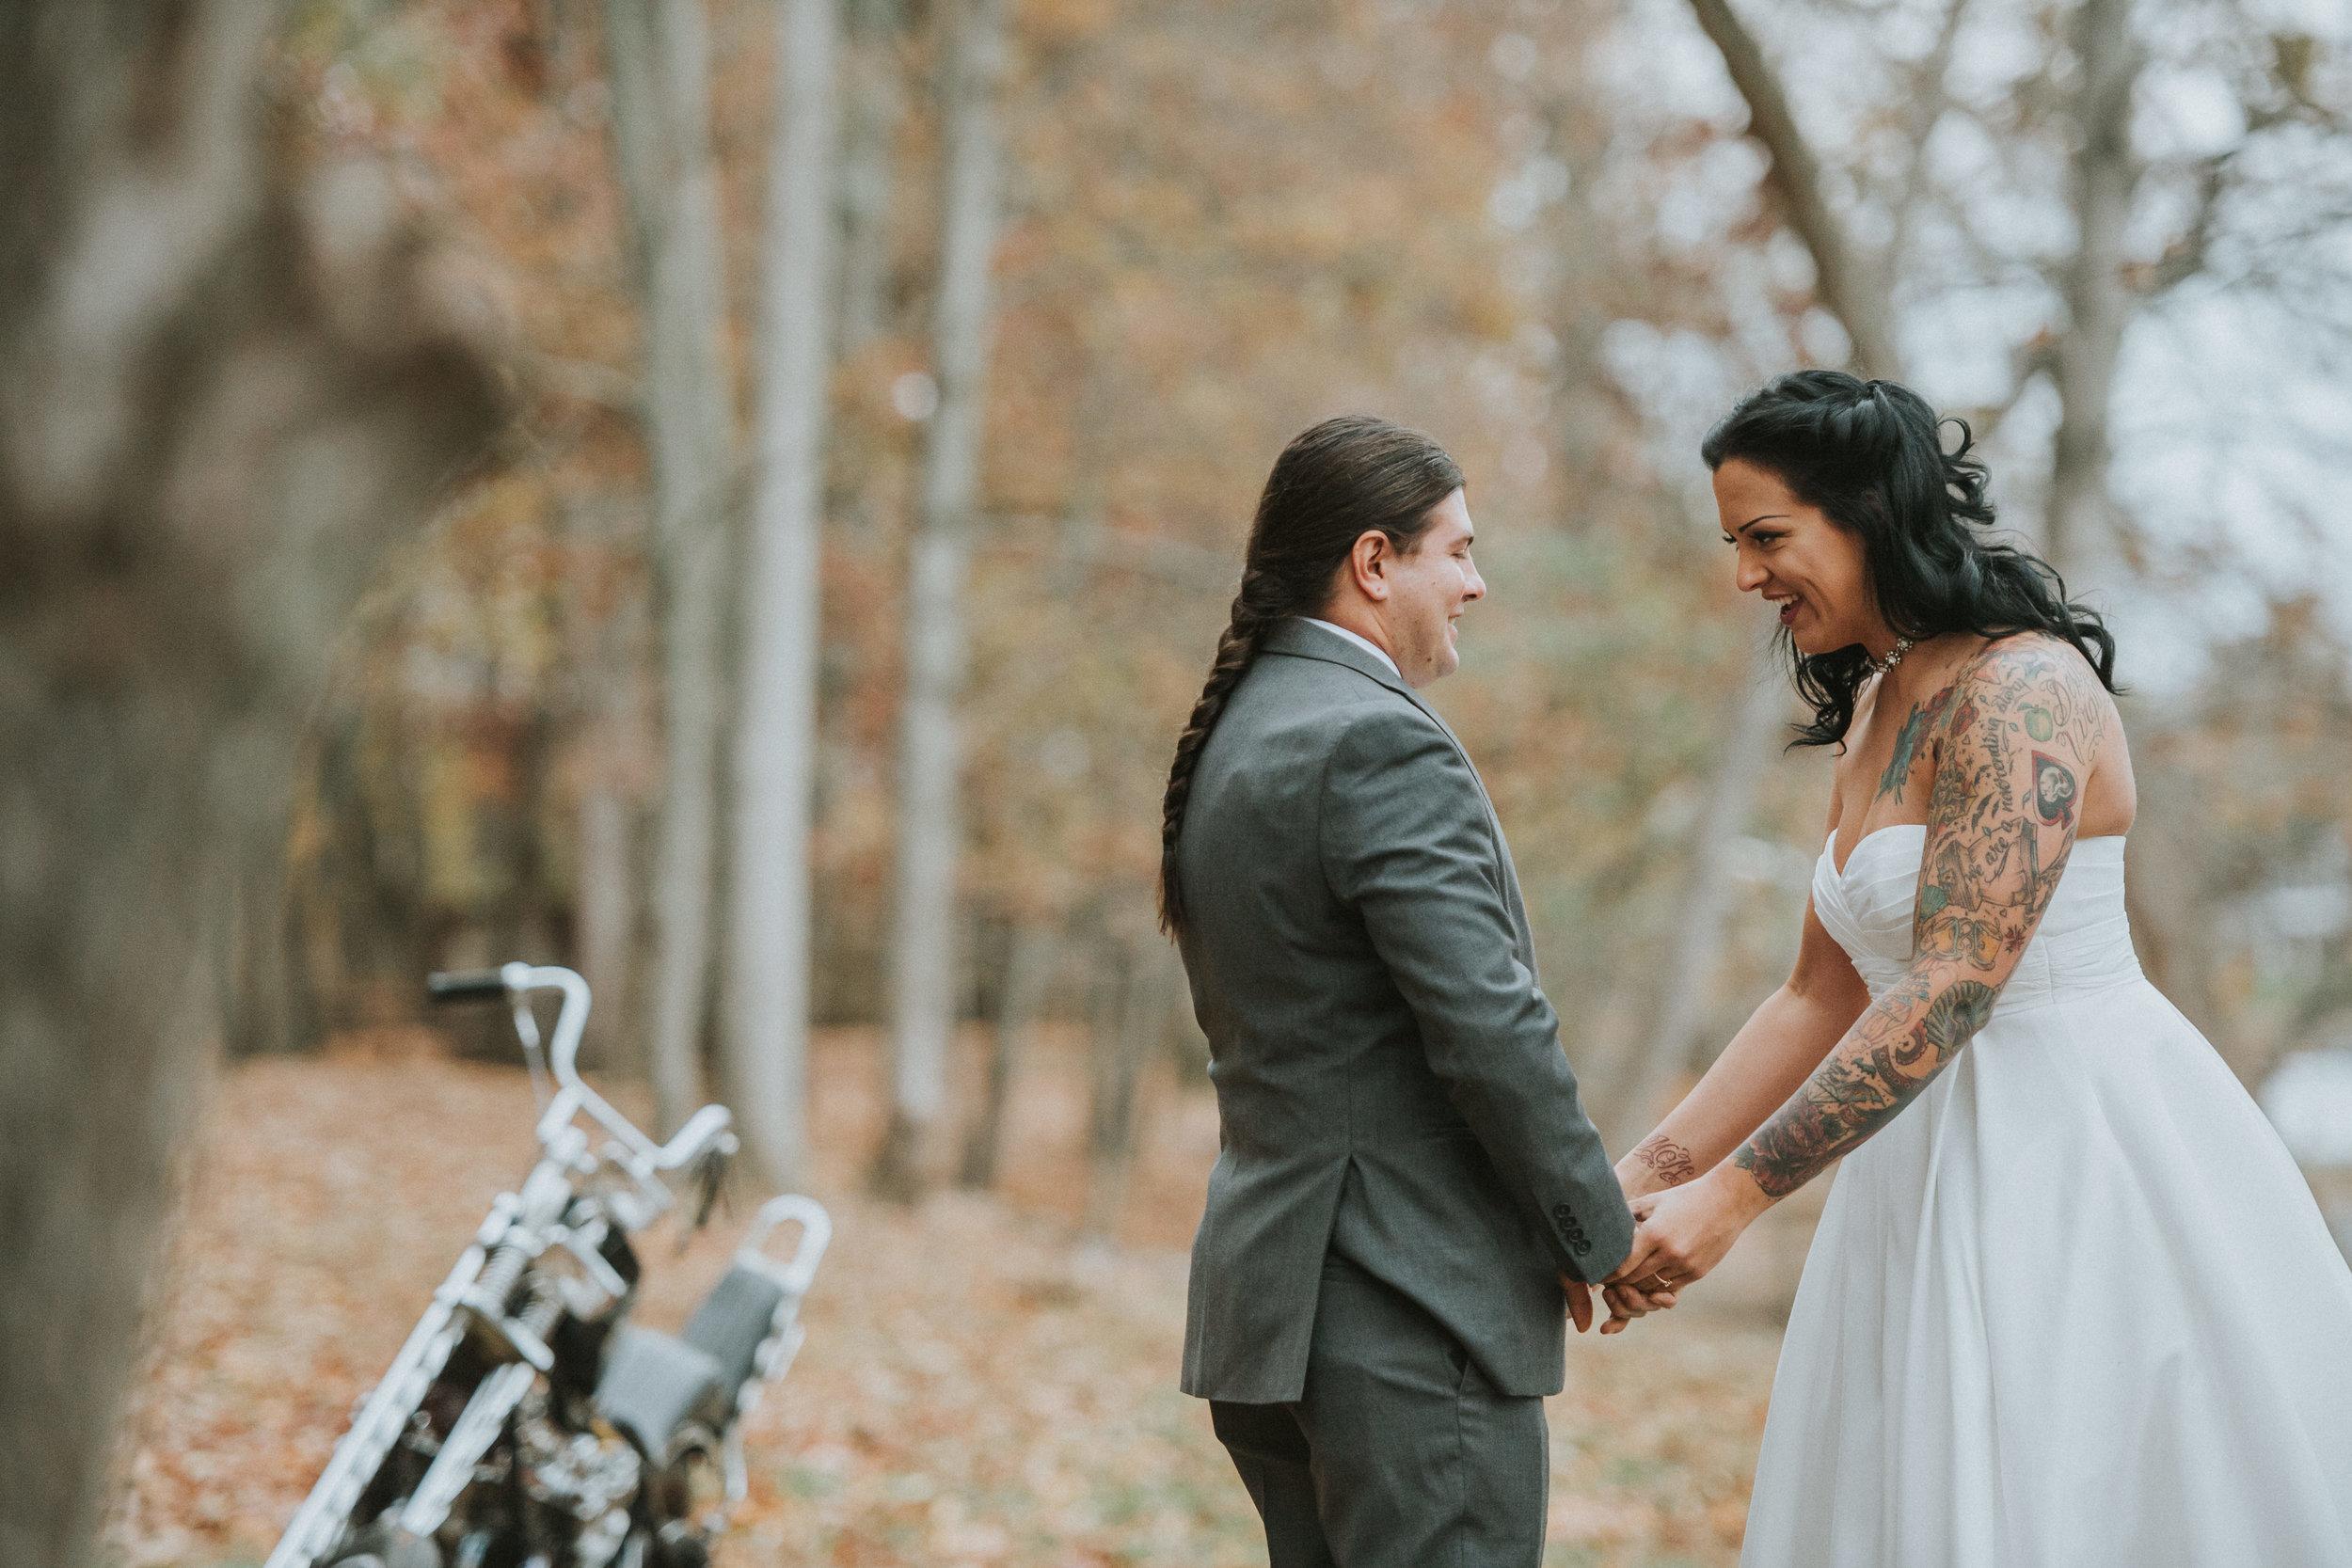 Rodes-Barn-Wedding-Mackenzie-and-Dylan-124.jpg